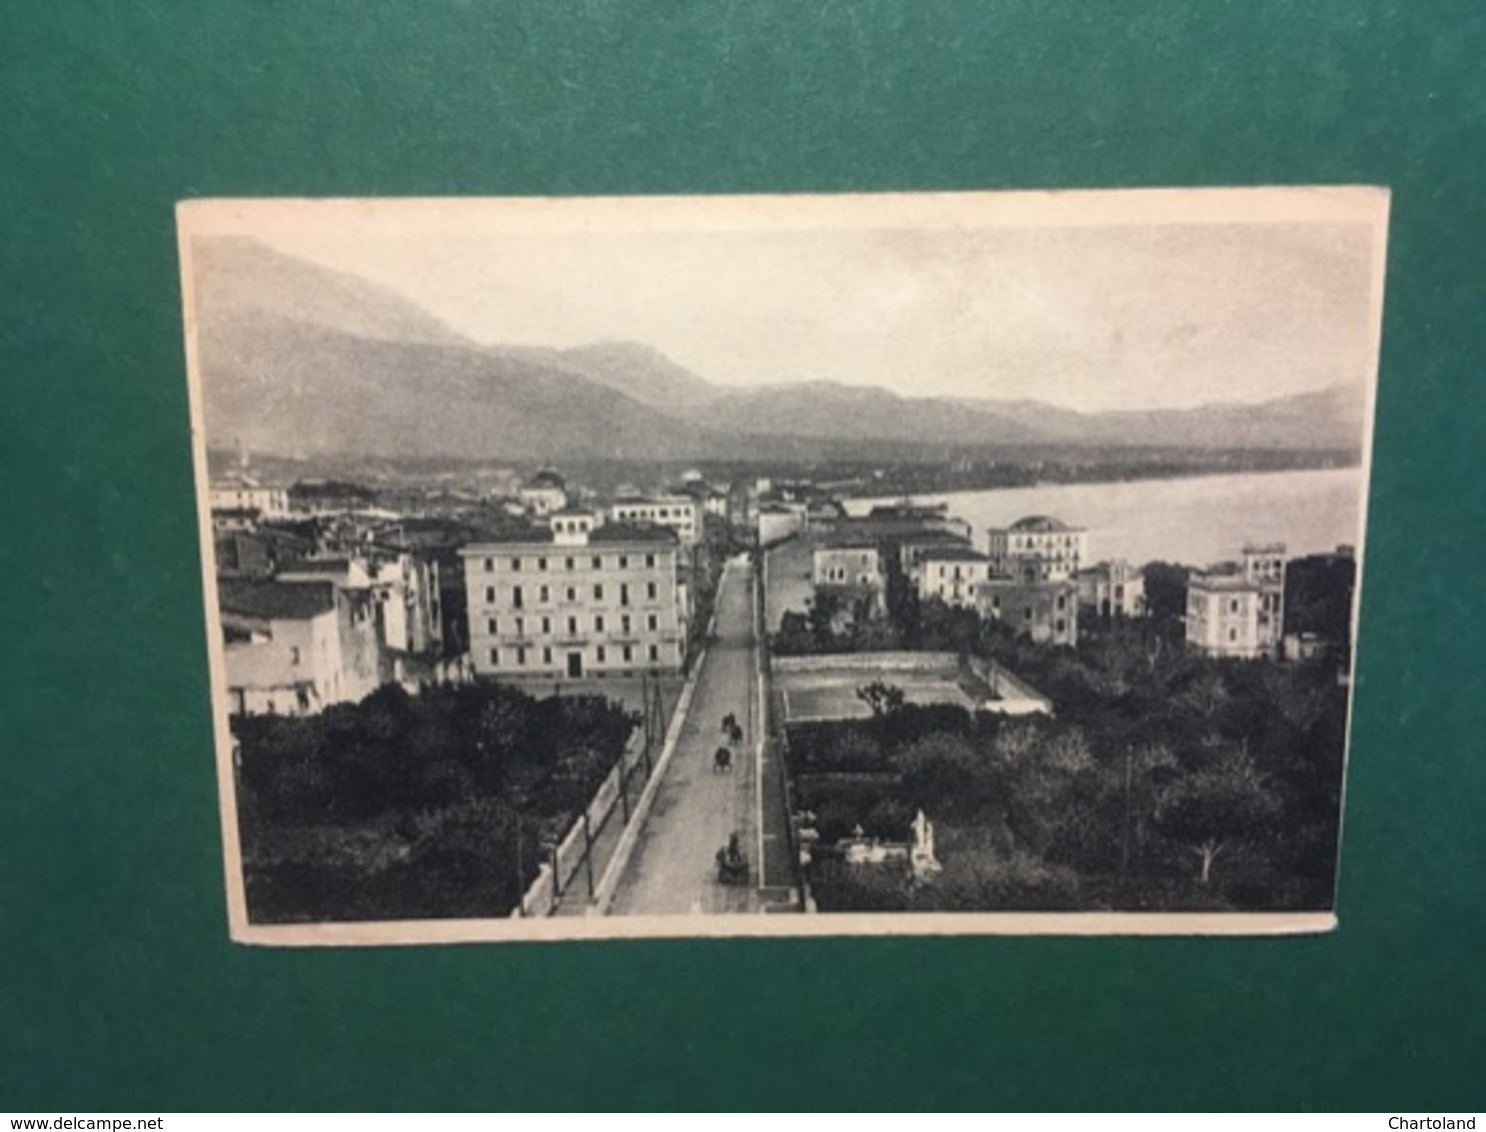 Cartolina Formia - Via Vitruvio Con Piazza Risorgimento E Panorama - 1938 - Latina